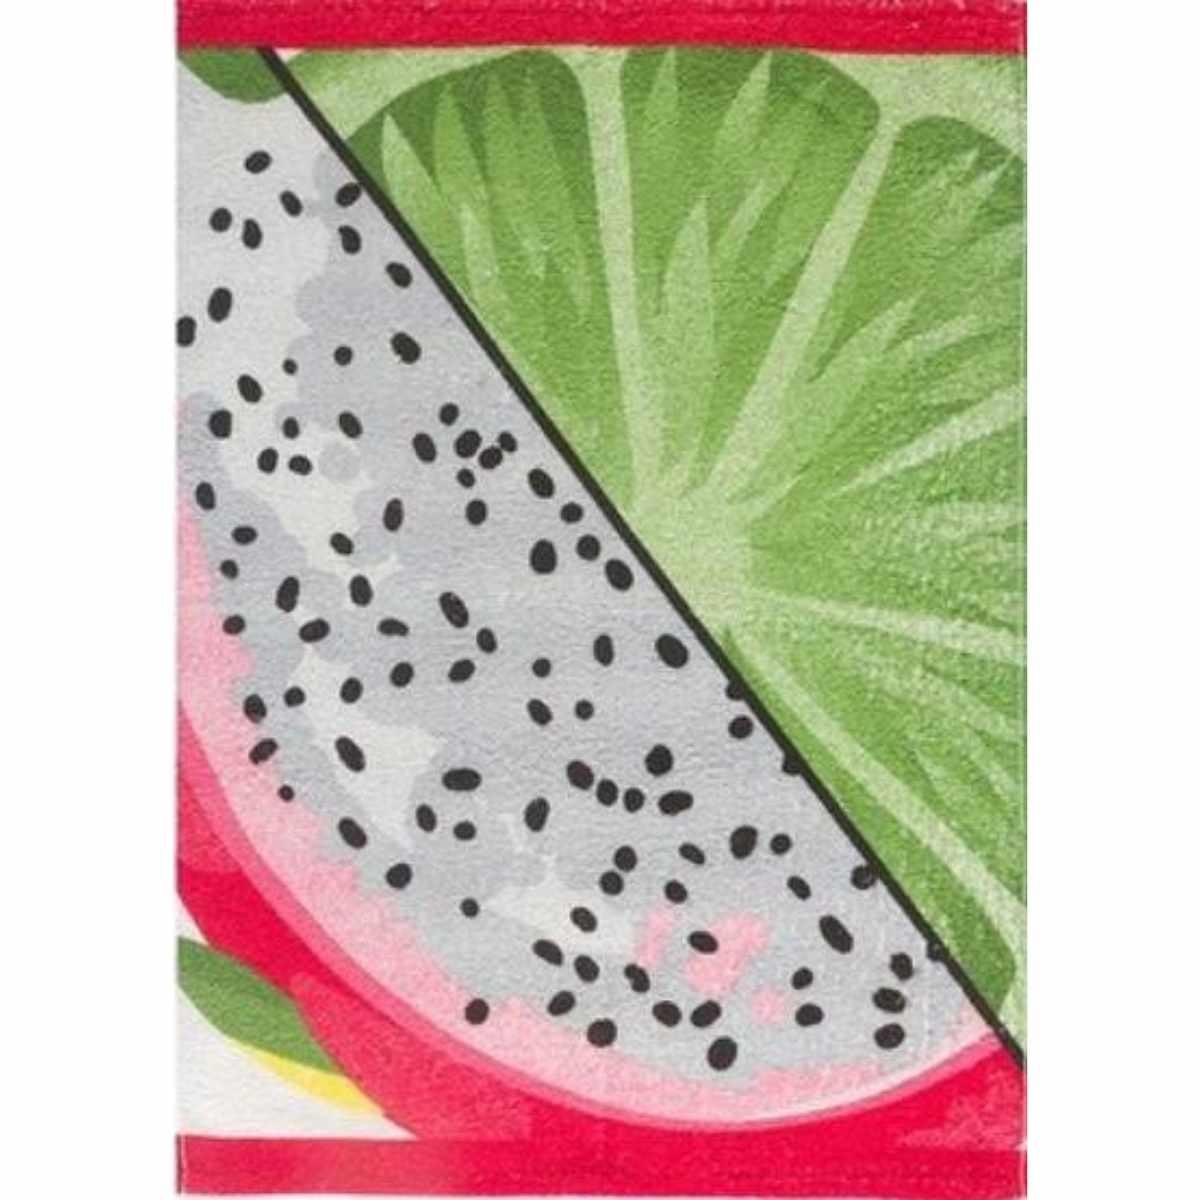 Pano de Copa Fiori  Fruit Mix 2